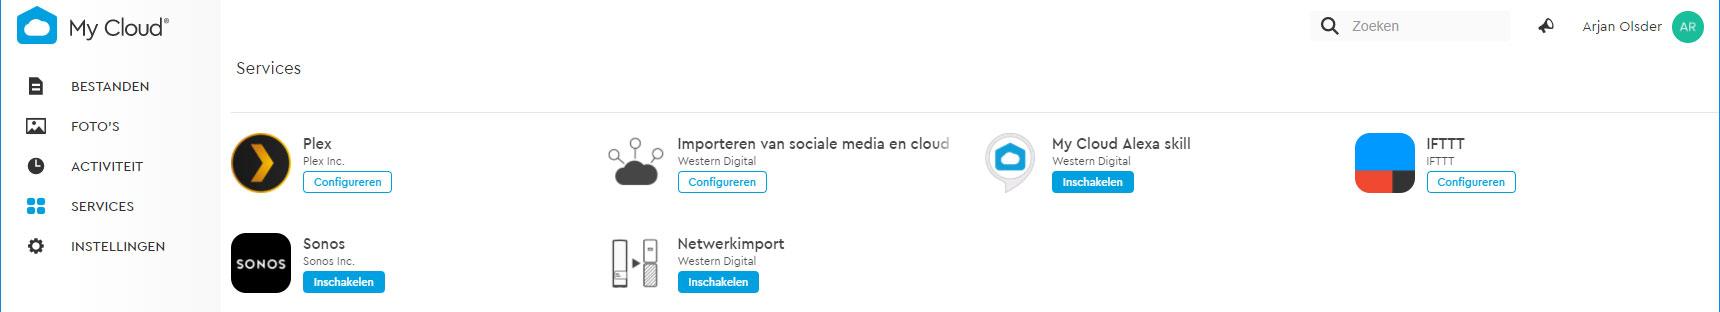 Review: WD My Cloud Home Duo (NAS) - GadgetGear nl